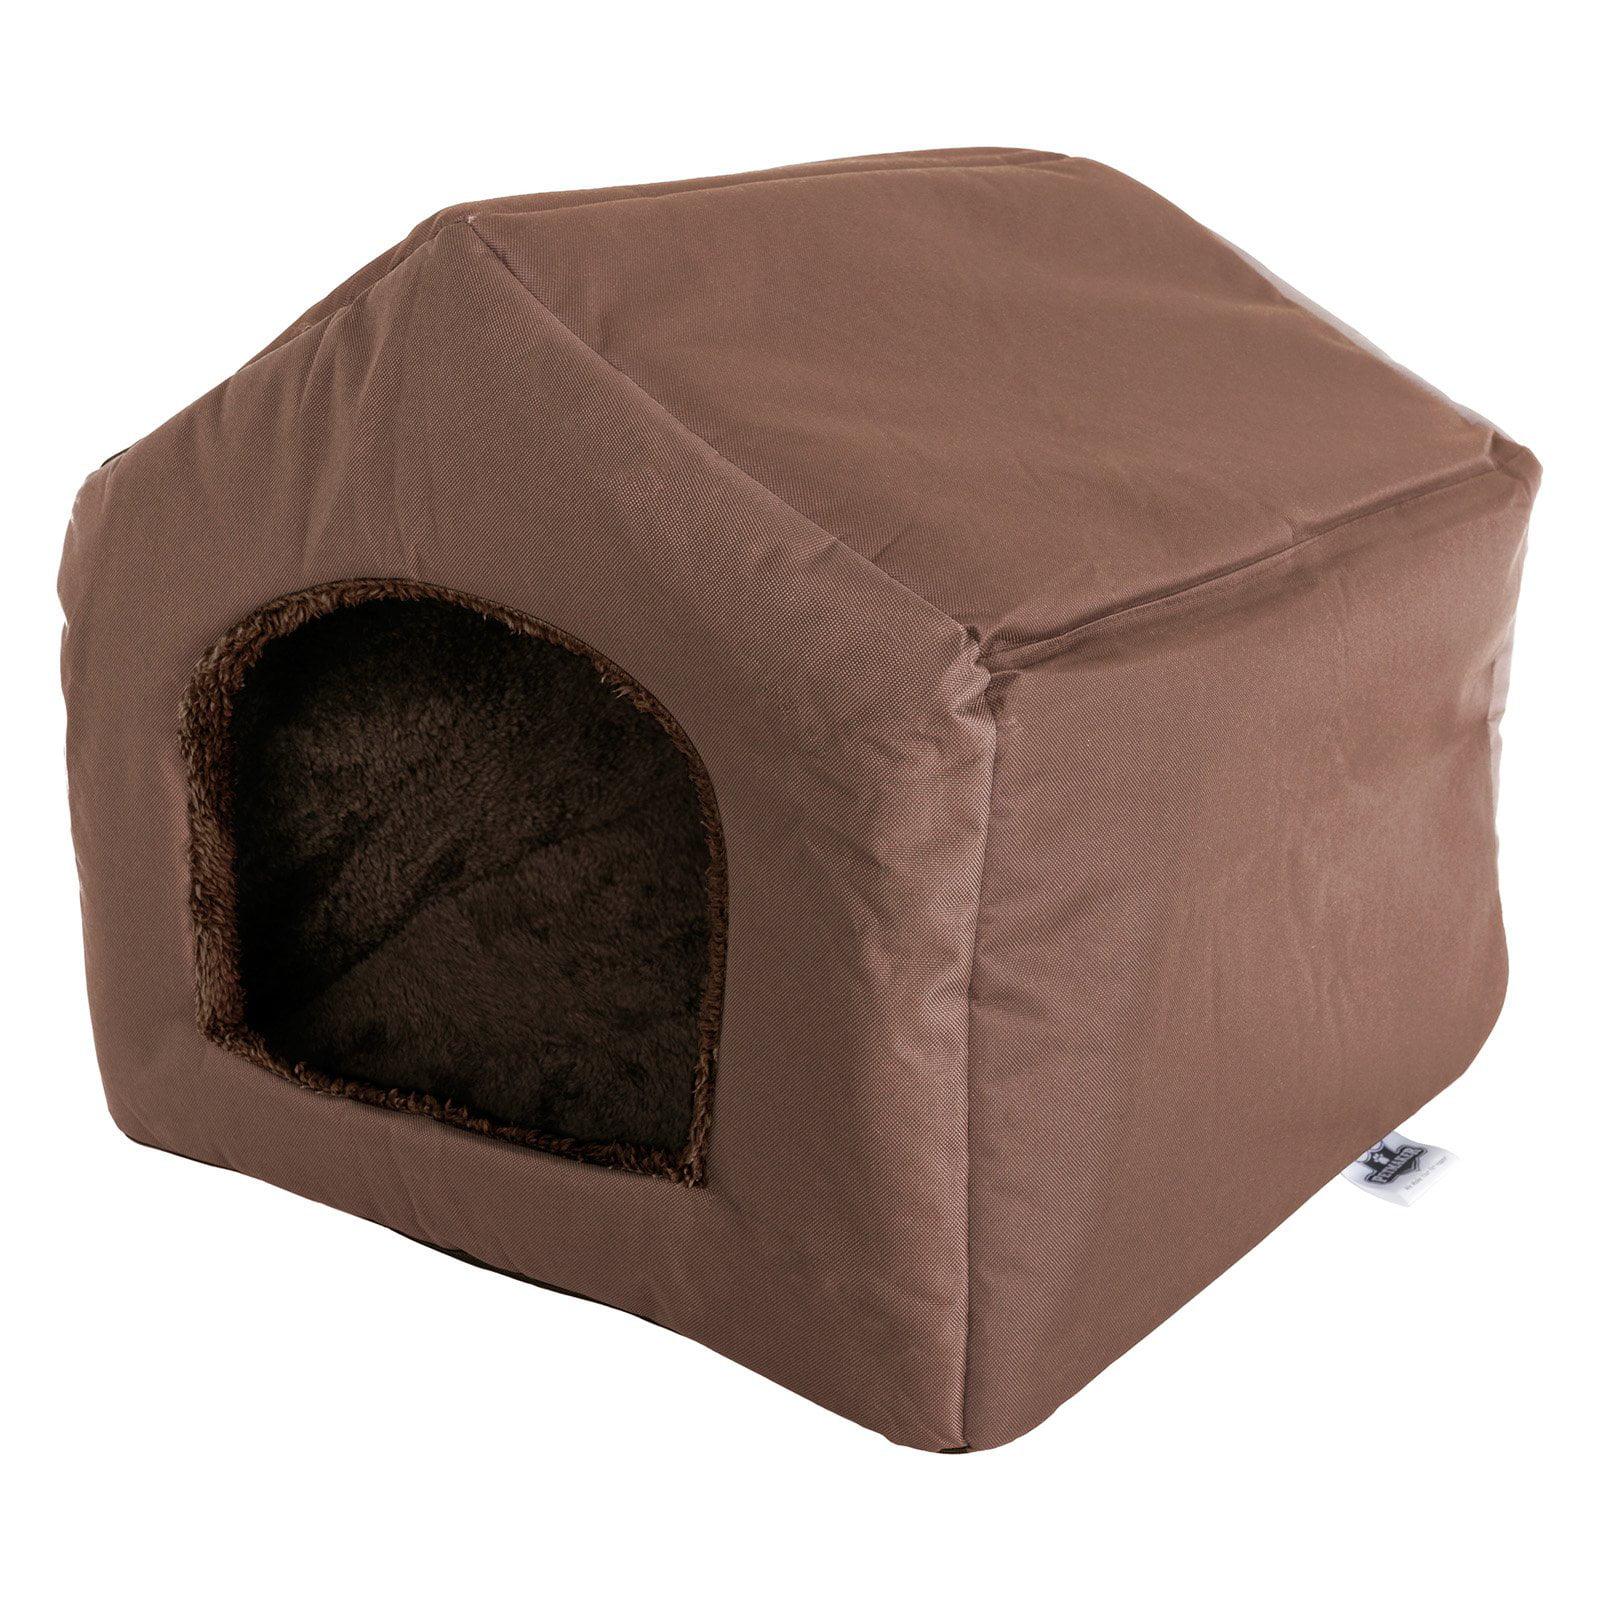 Petmaker Cottage House Pet Bed